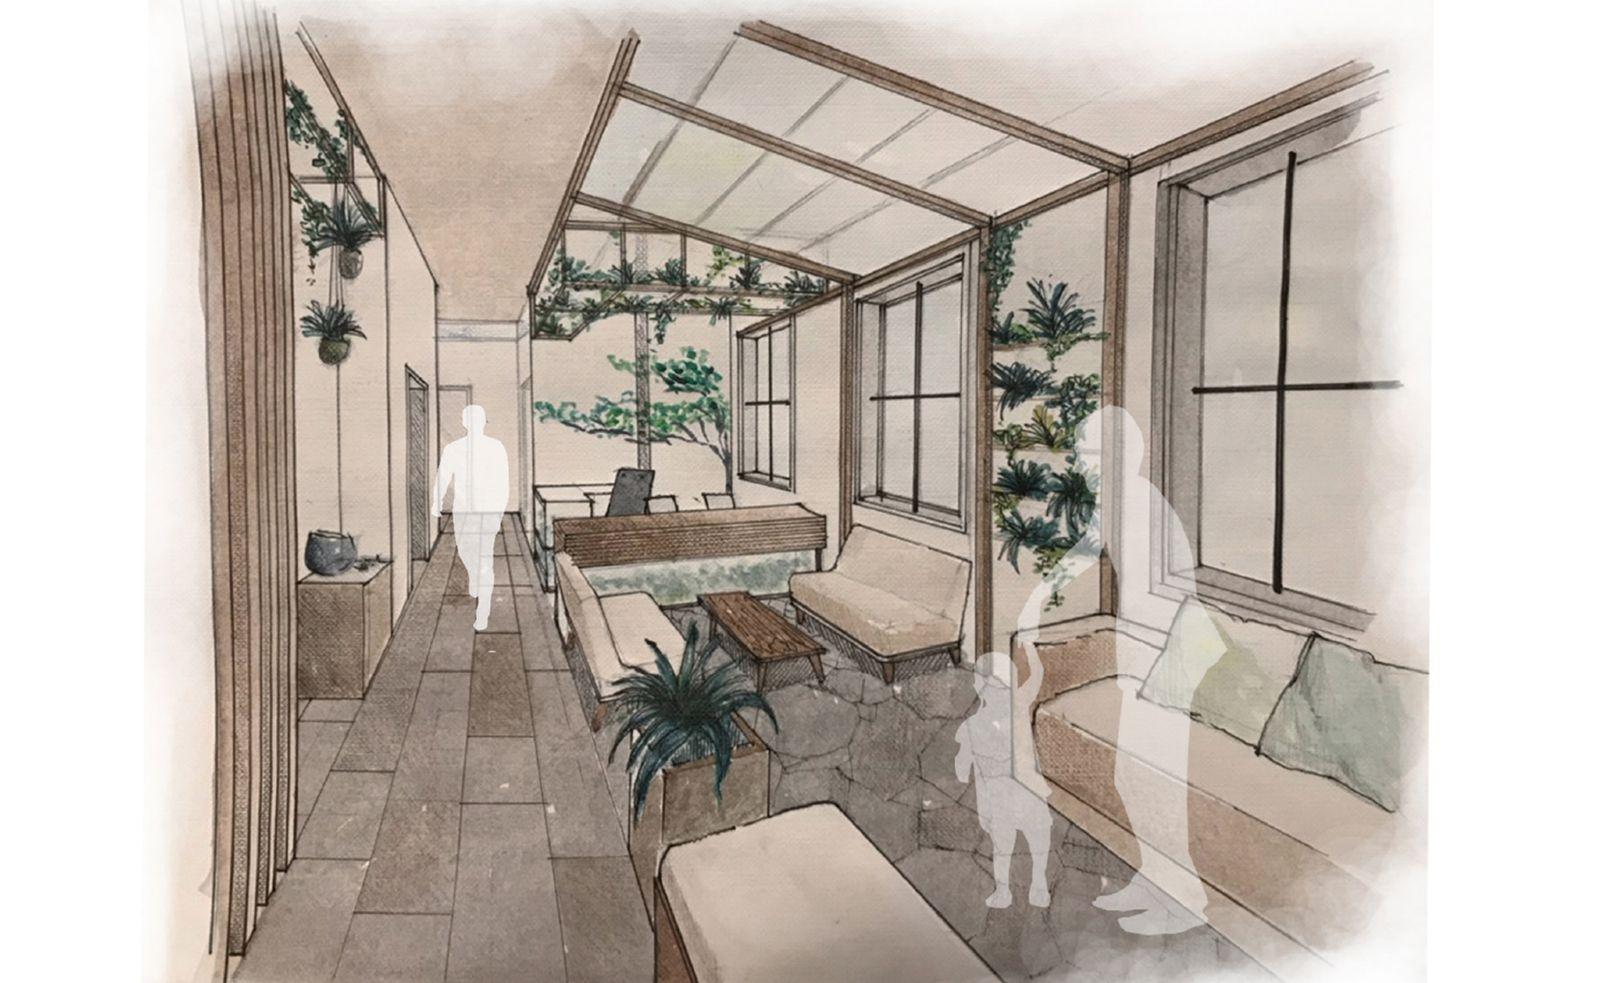 Interior perspective - Reception area